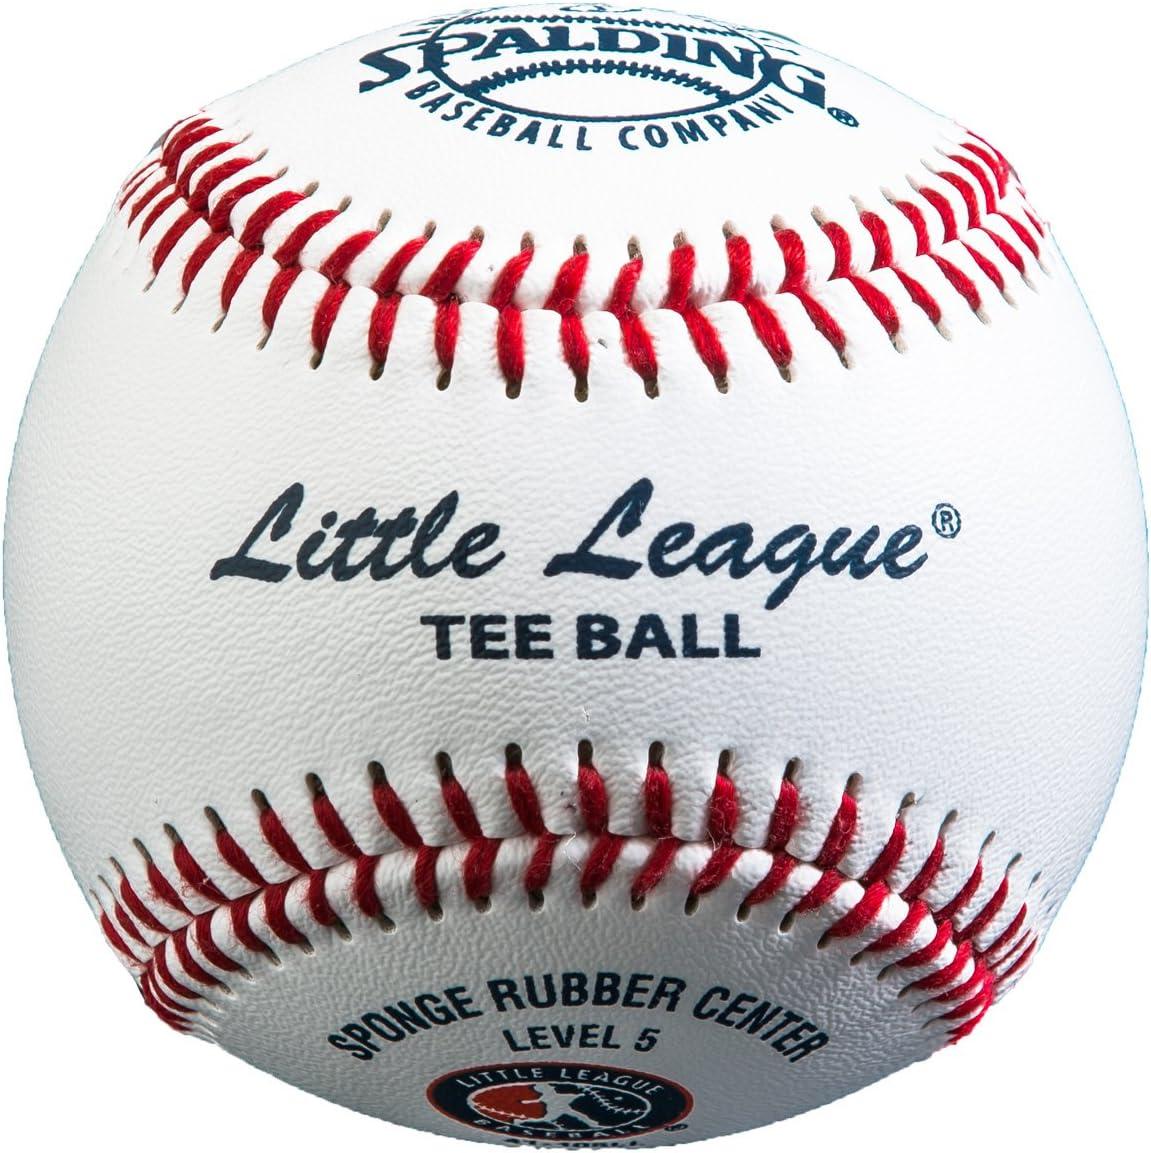 Spalding poco Liga® tee Pelota de béisbol (1 docena): Amazon.es ...